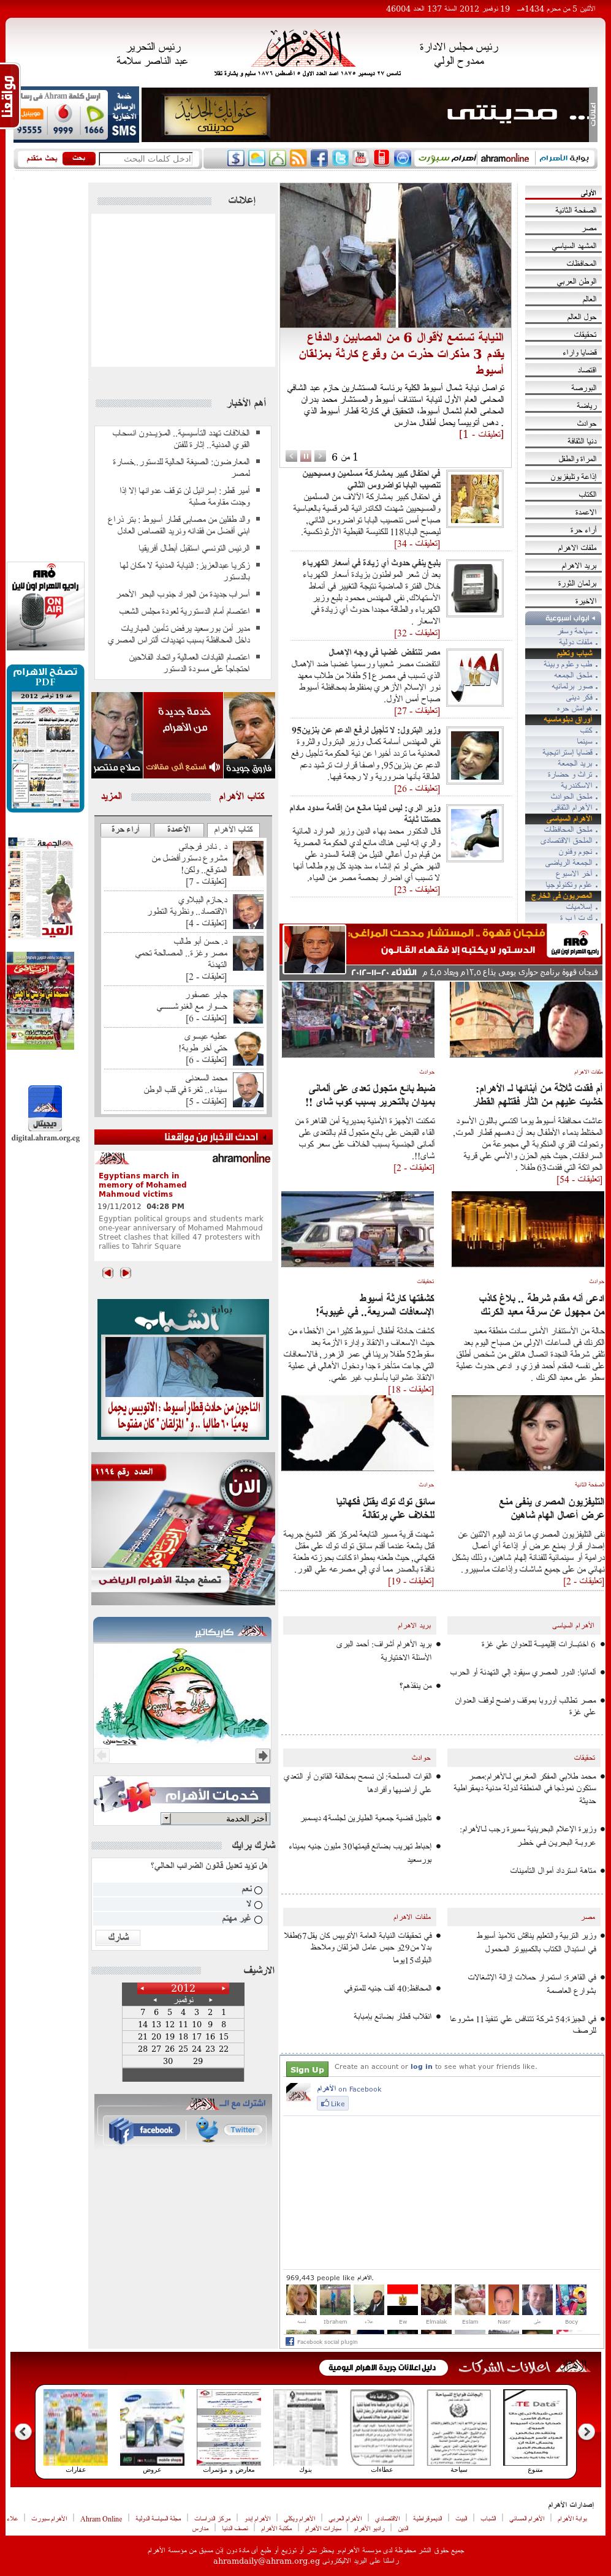 Al-Ahram at Monday Nov. 19, 2012, 5 p.m. UTC